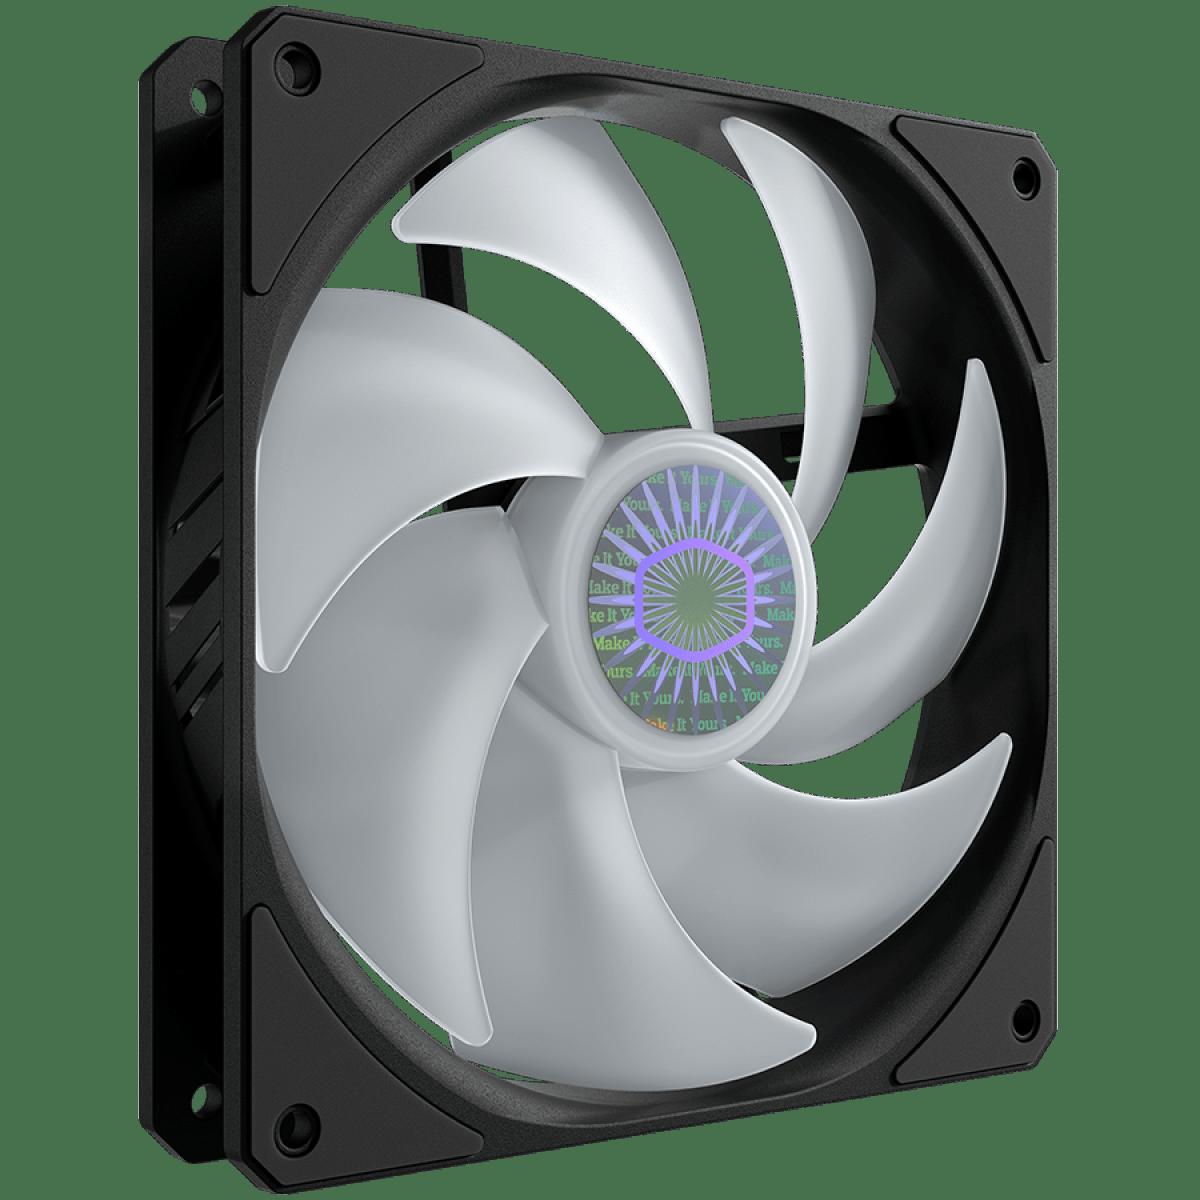 cooler para gabinete cooler master sickleflow mf140 argb 140mm 1800rpm mfx b4dn 14npa r1 104806